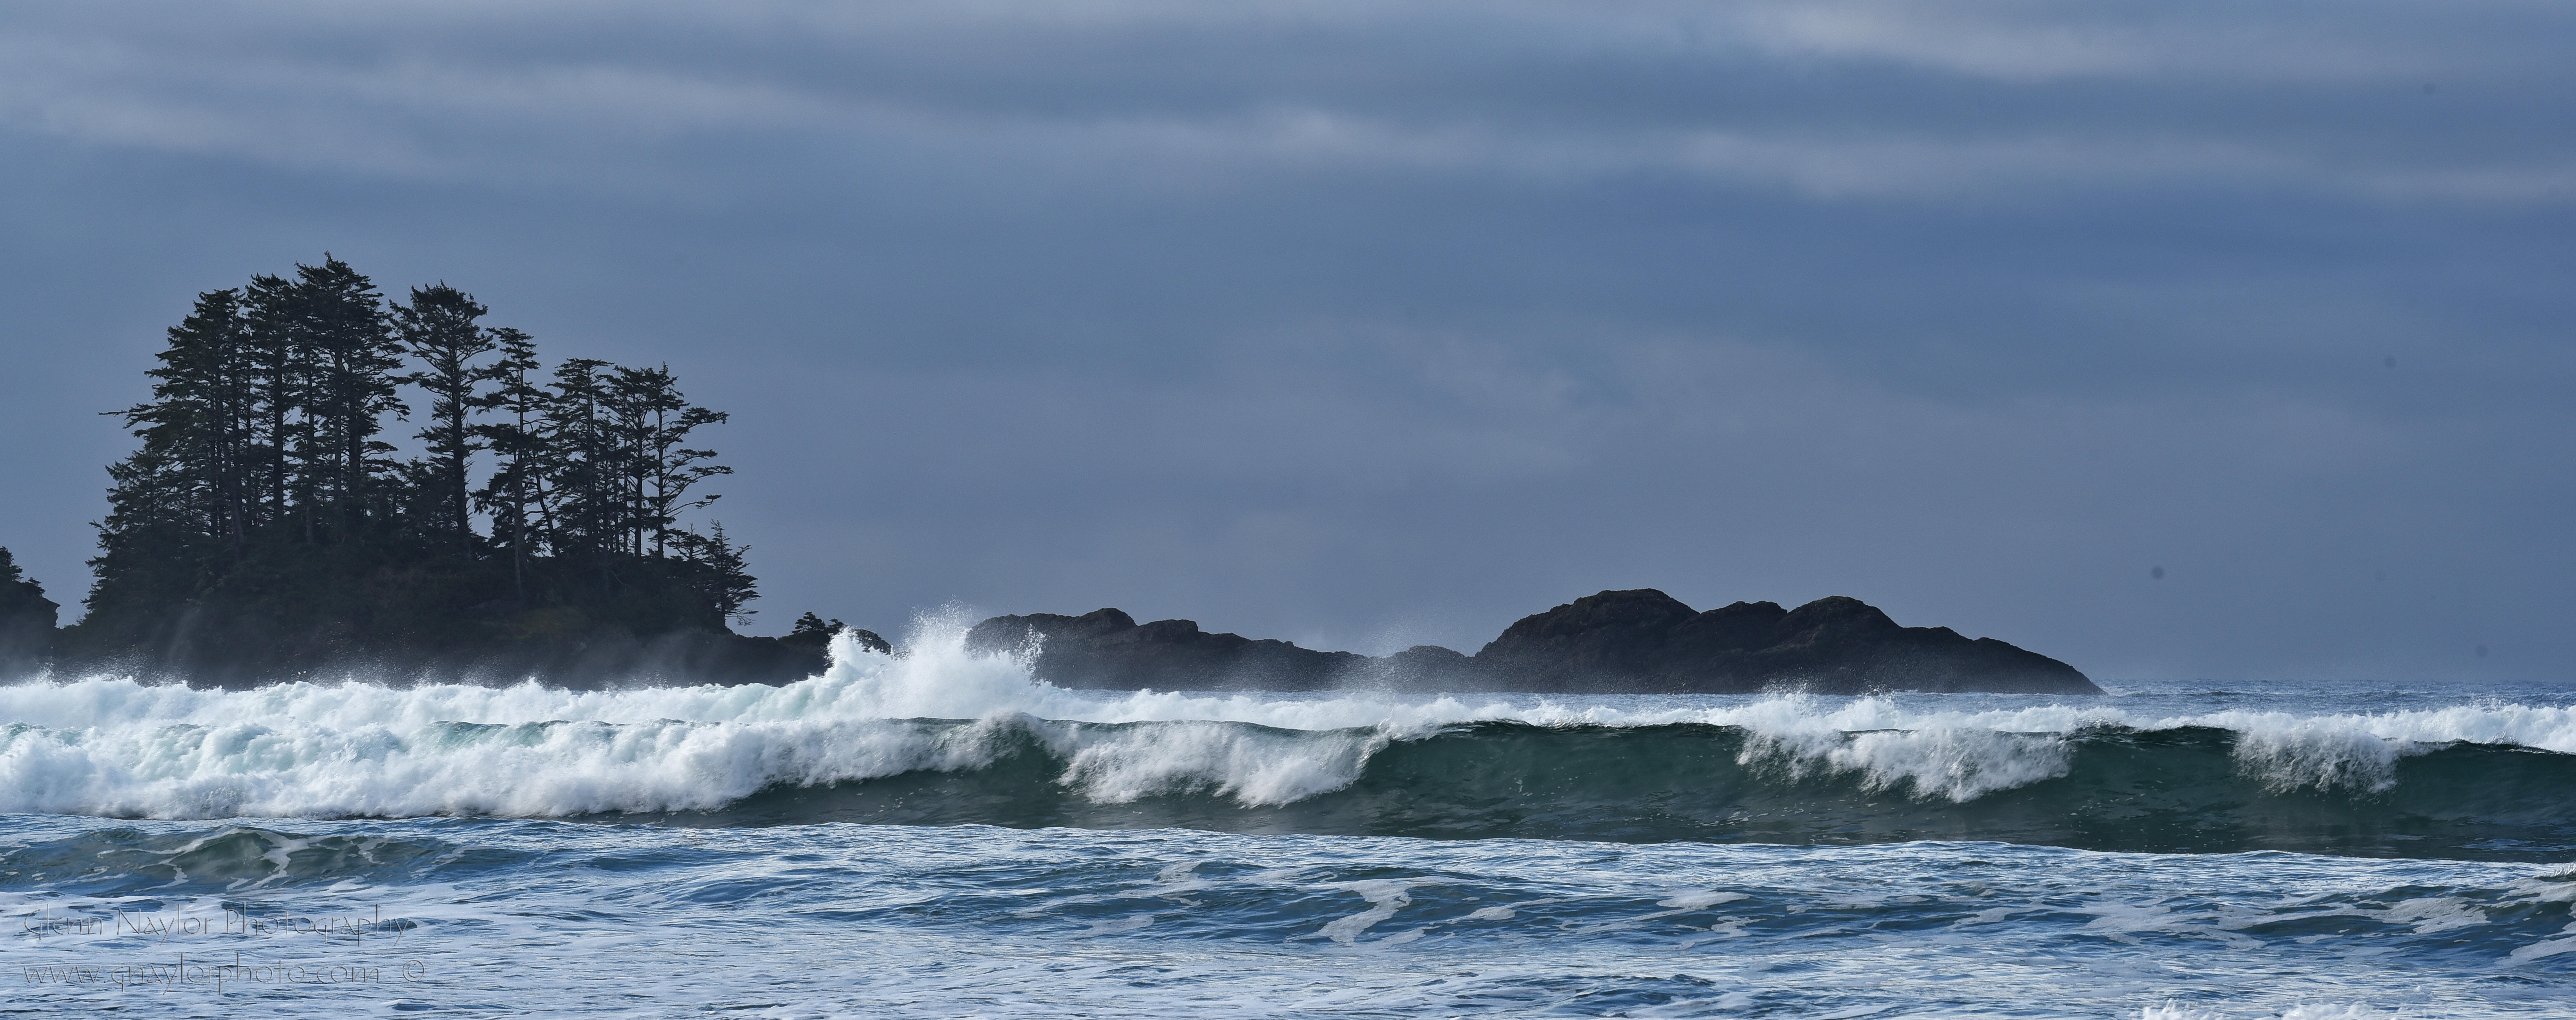 Morning waves Chesterman beach Vanc Island